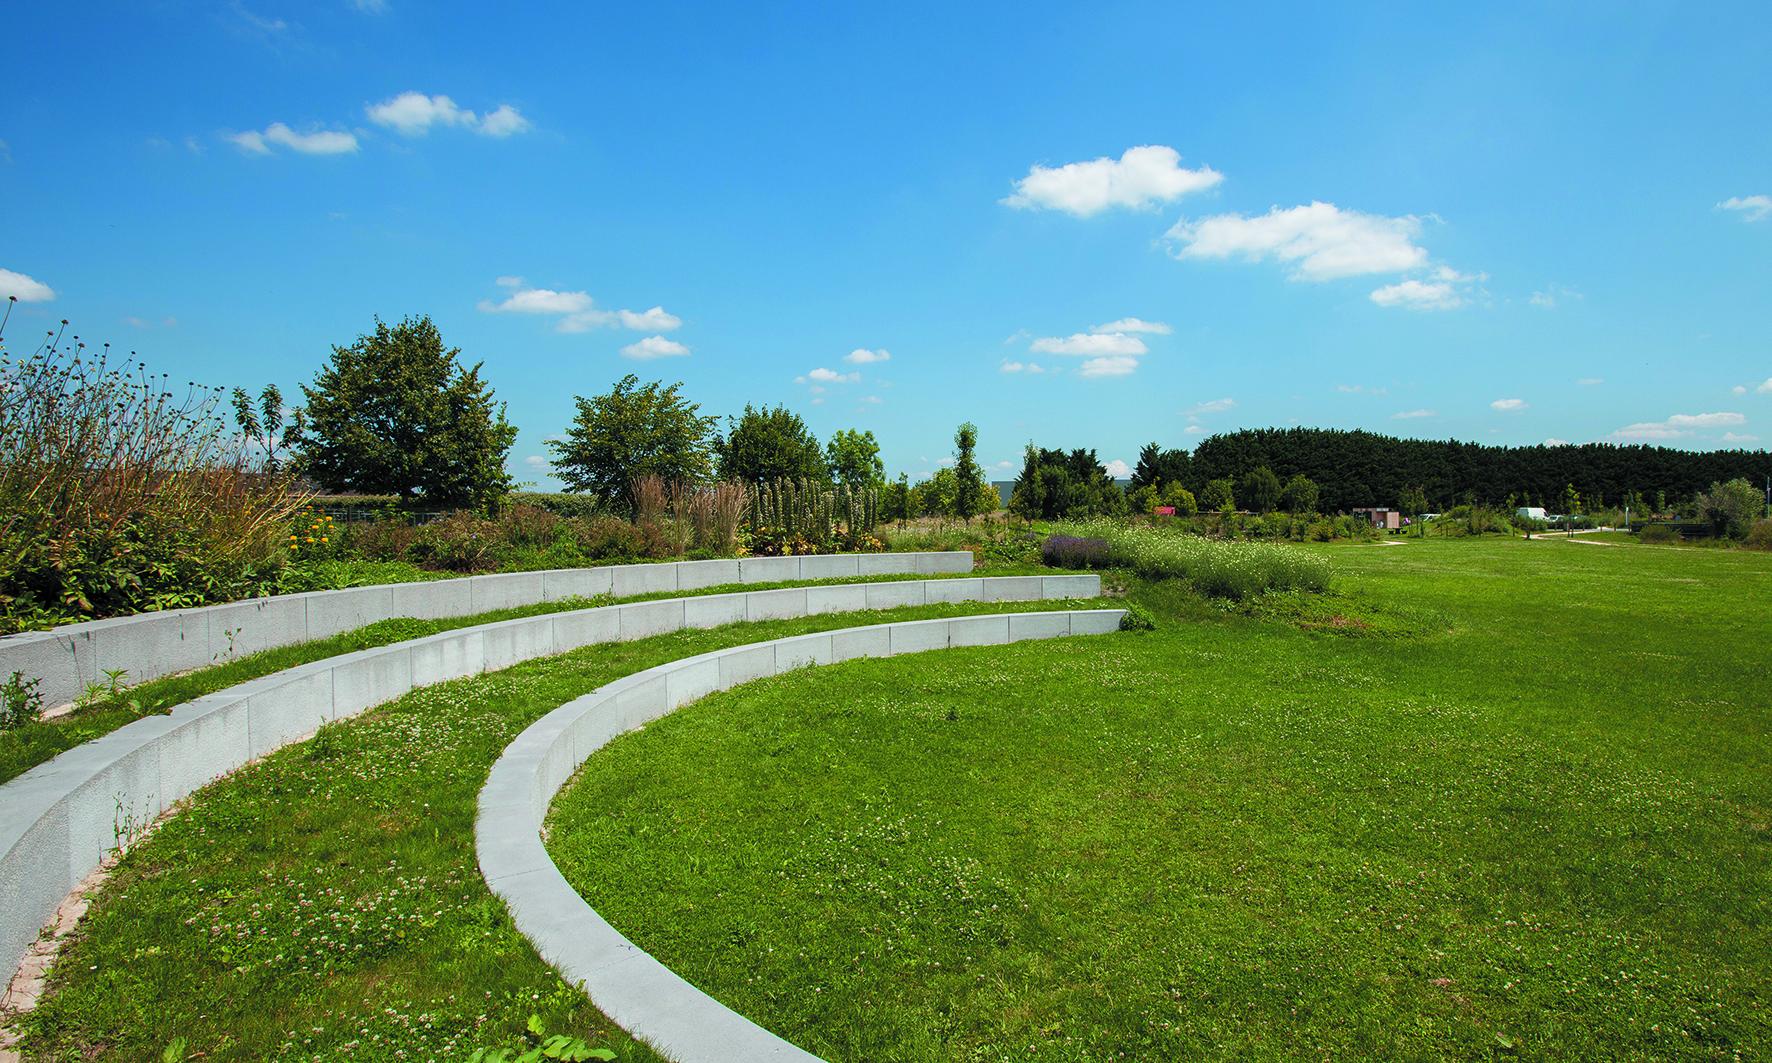 Jardin public la coul e verte dou la fontaine 19 juin for Architecture de jardin